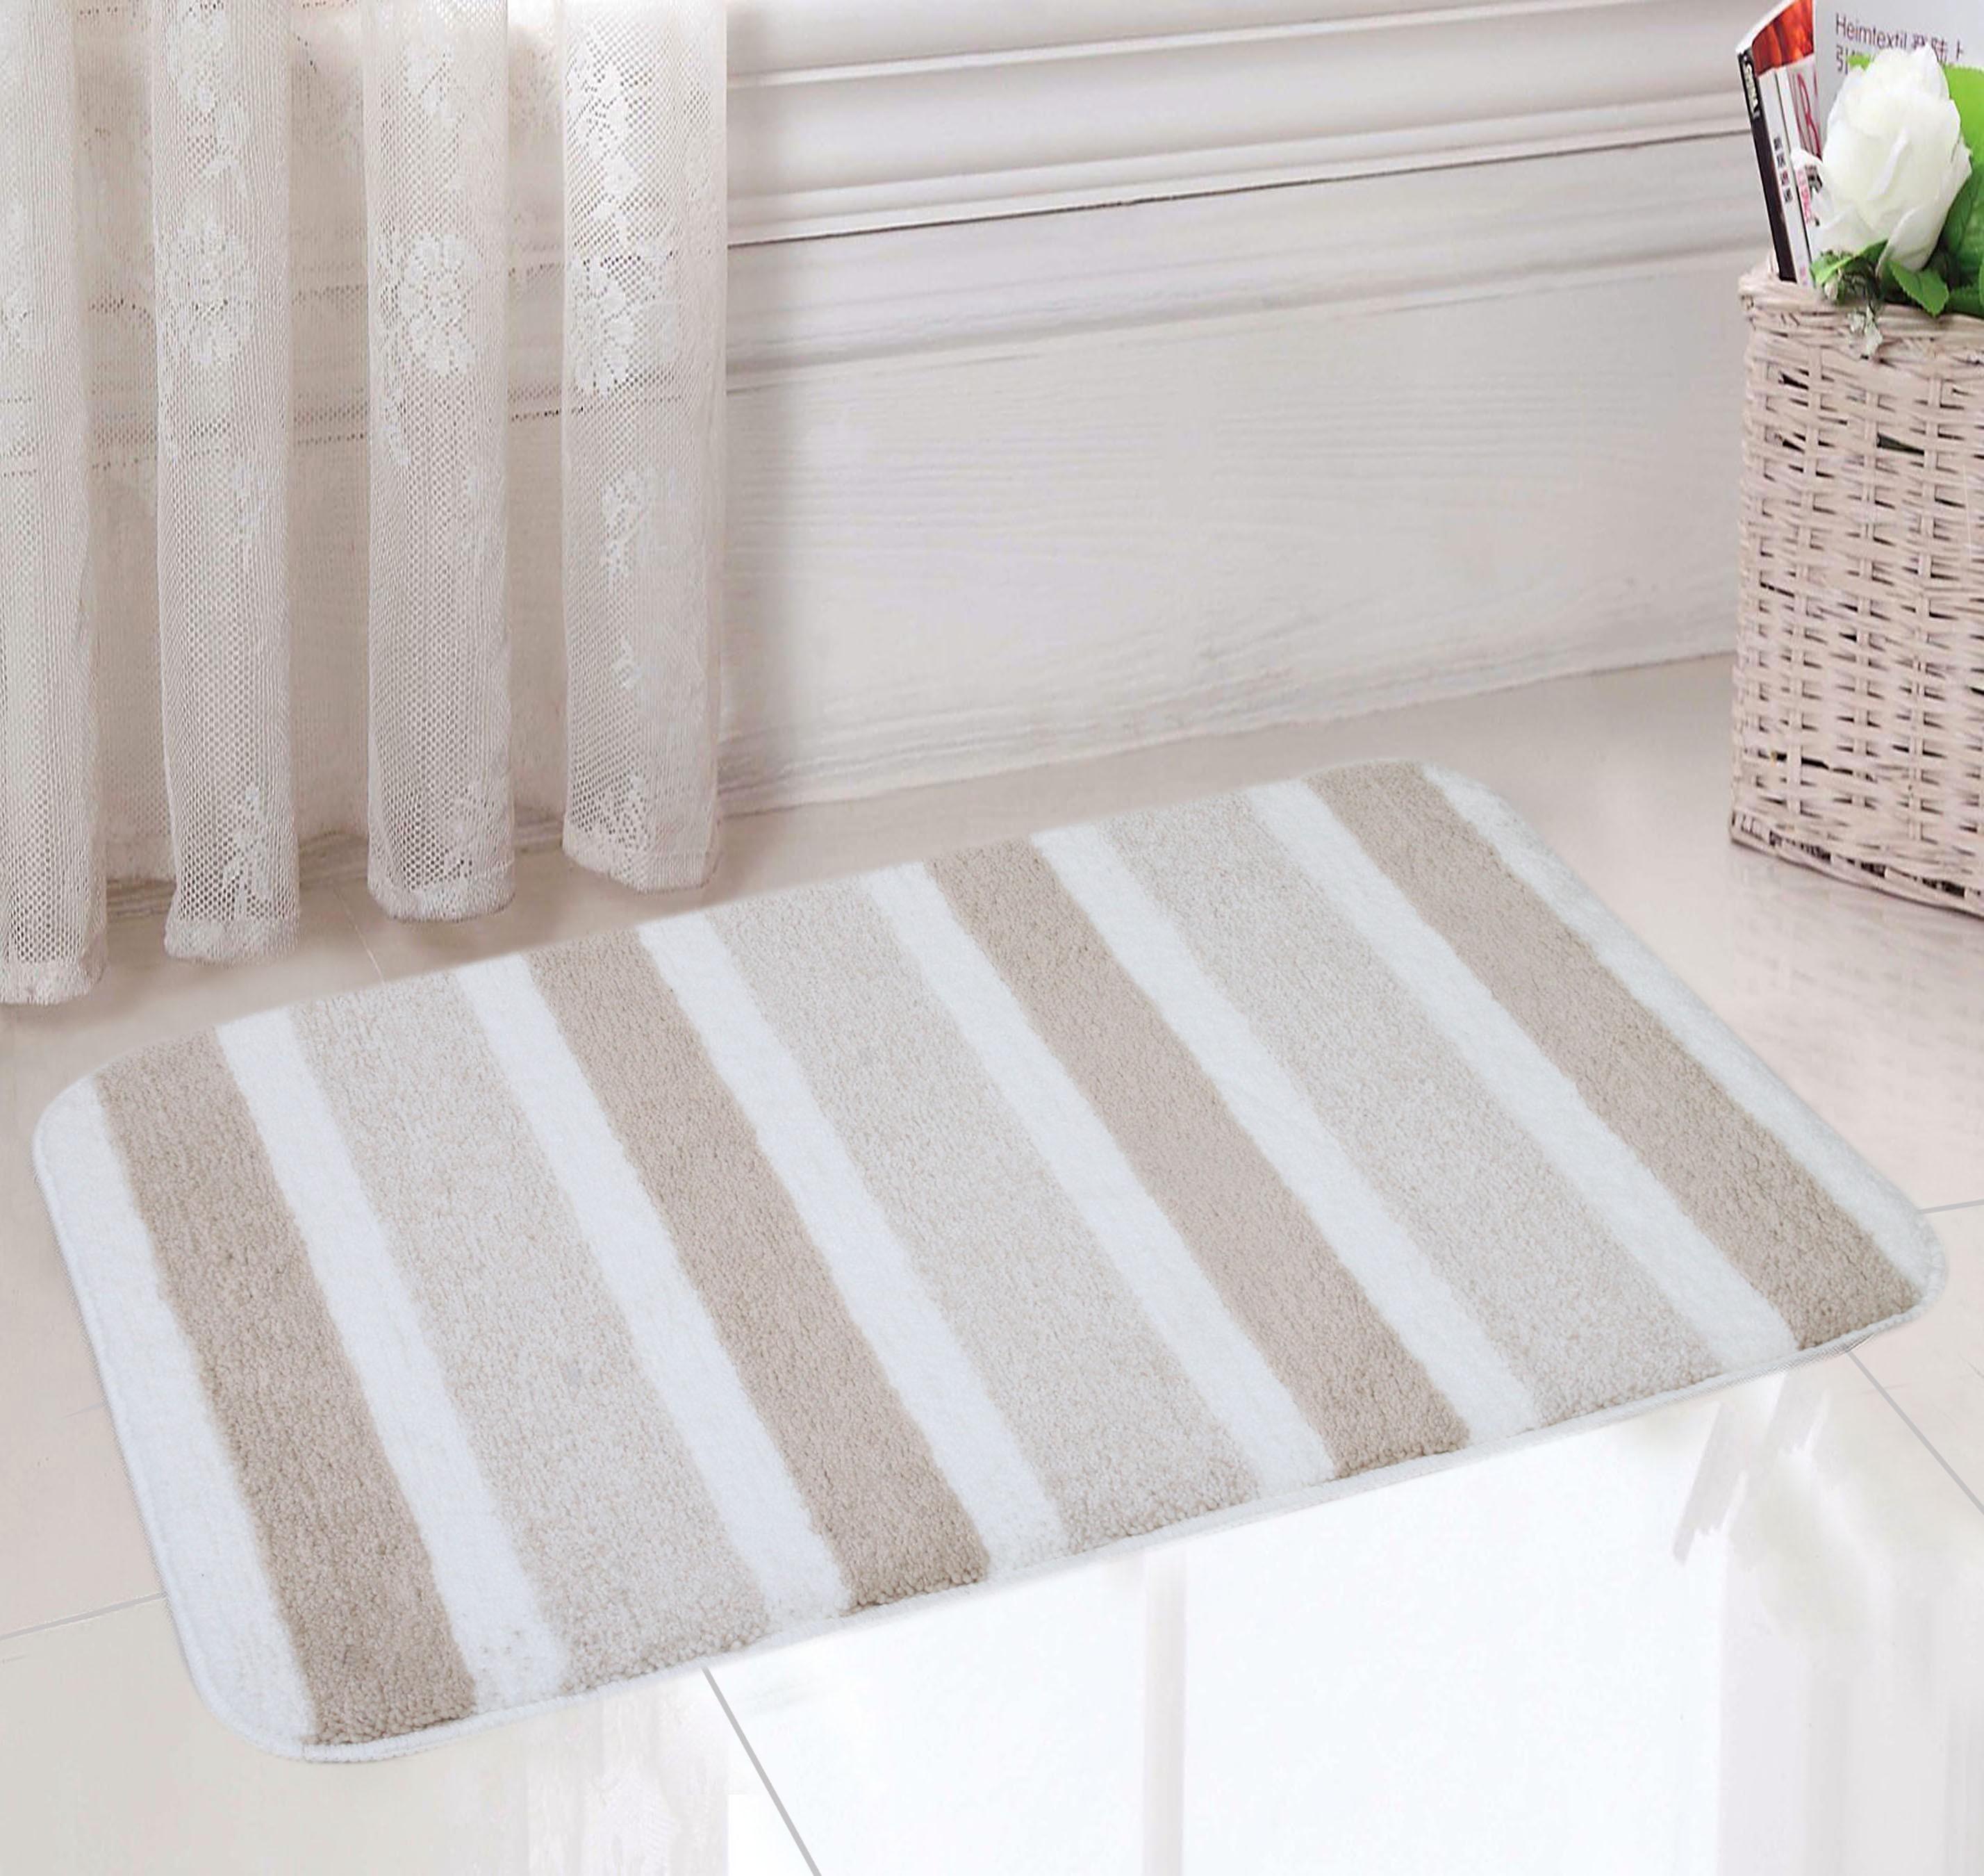 Saral Home Polyester Medium Bath Mat Bathmat